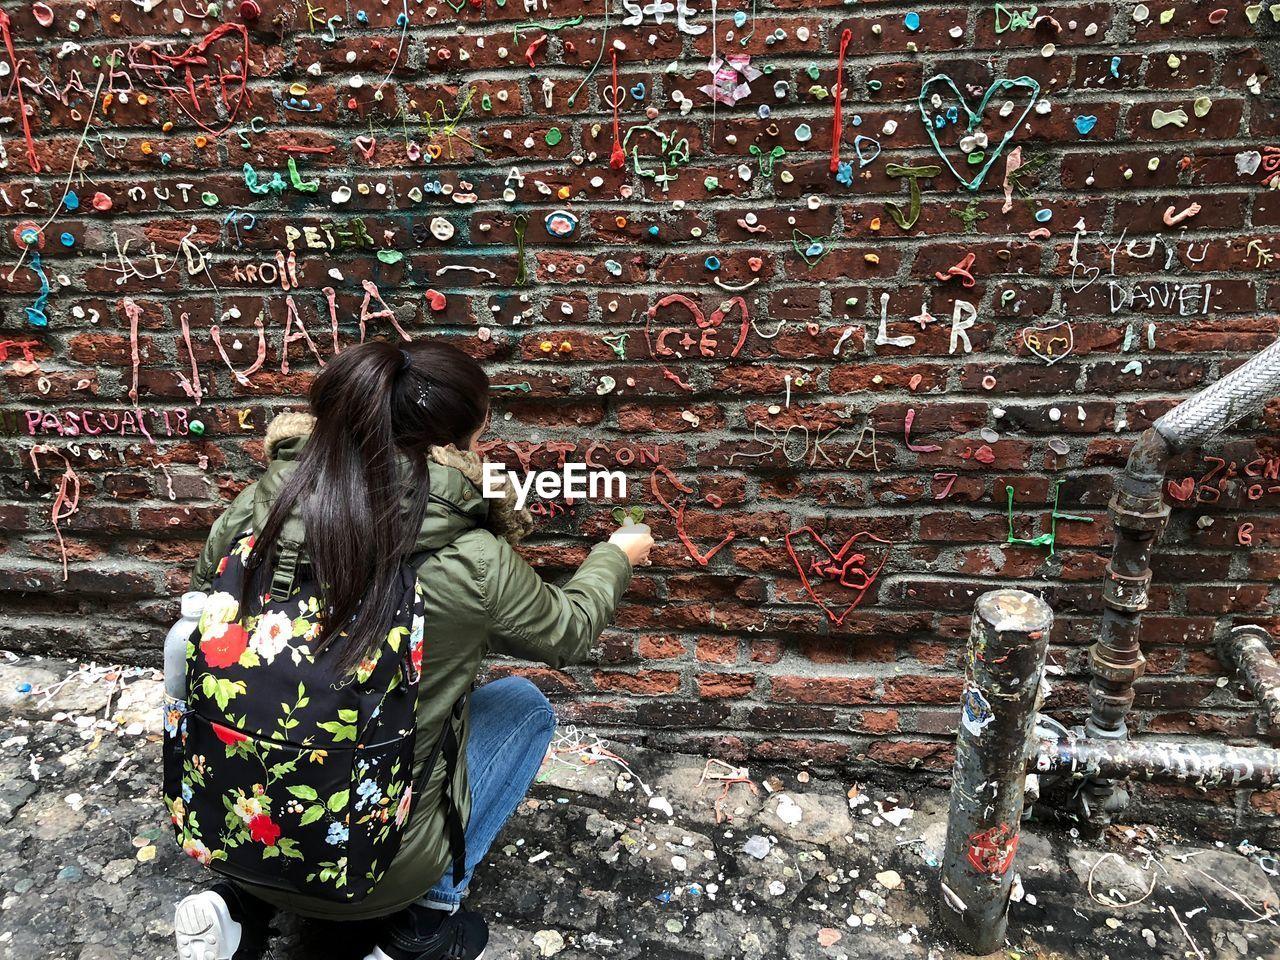 Woman decorating gum wall